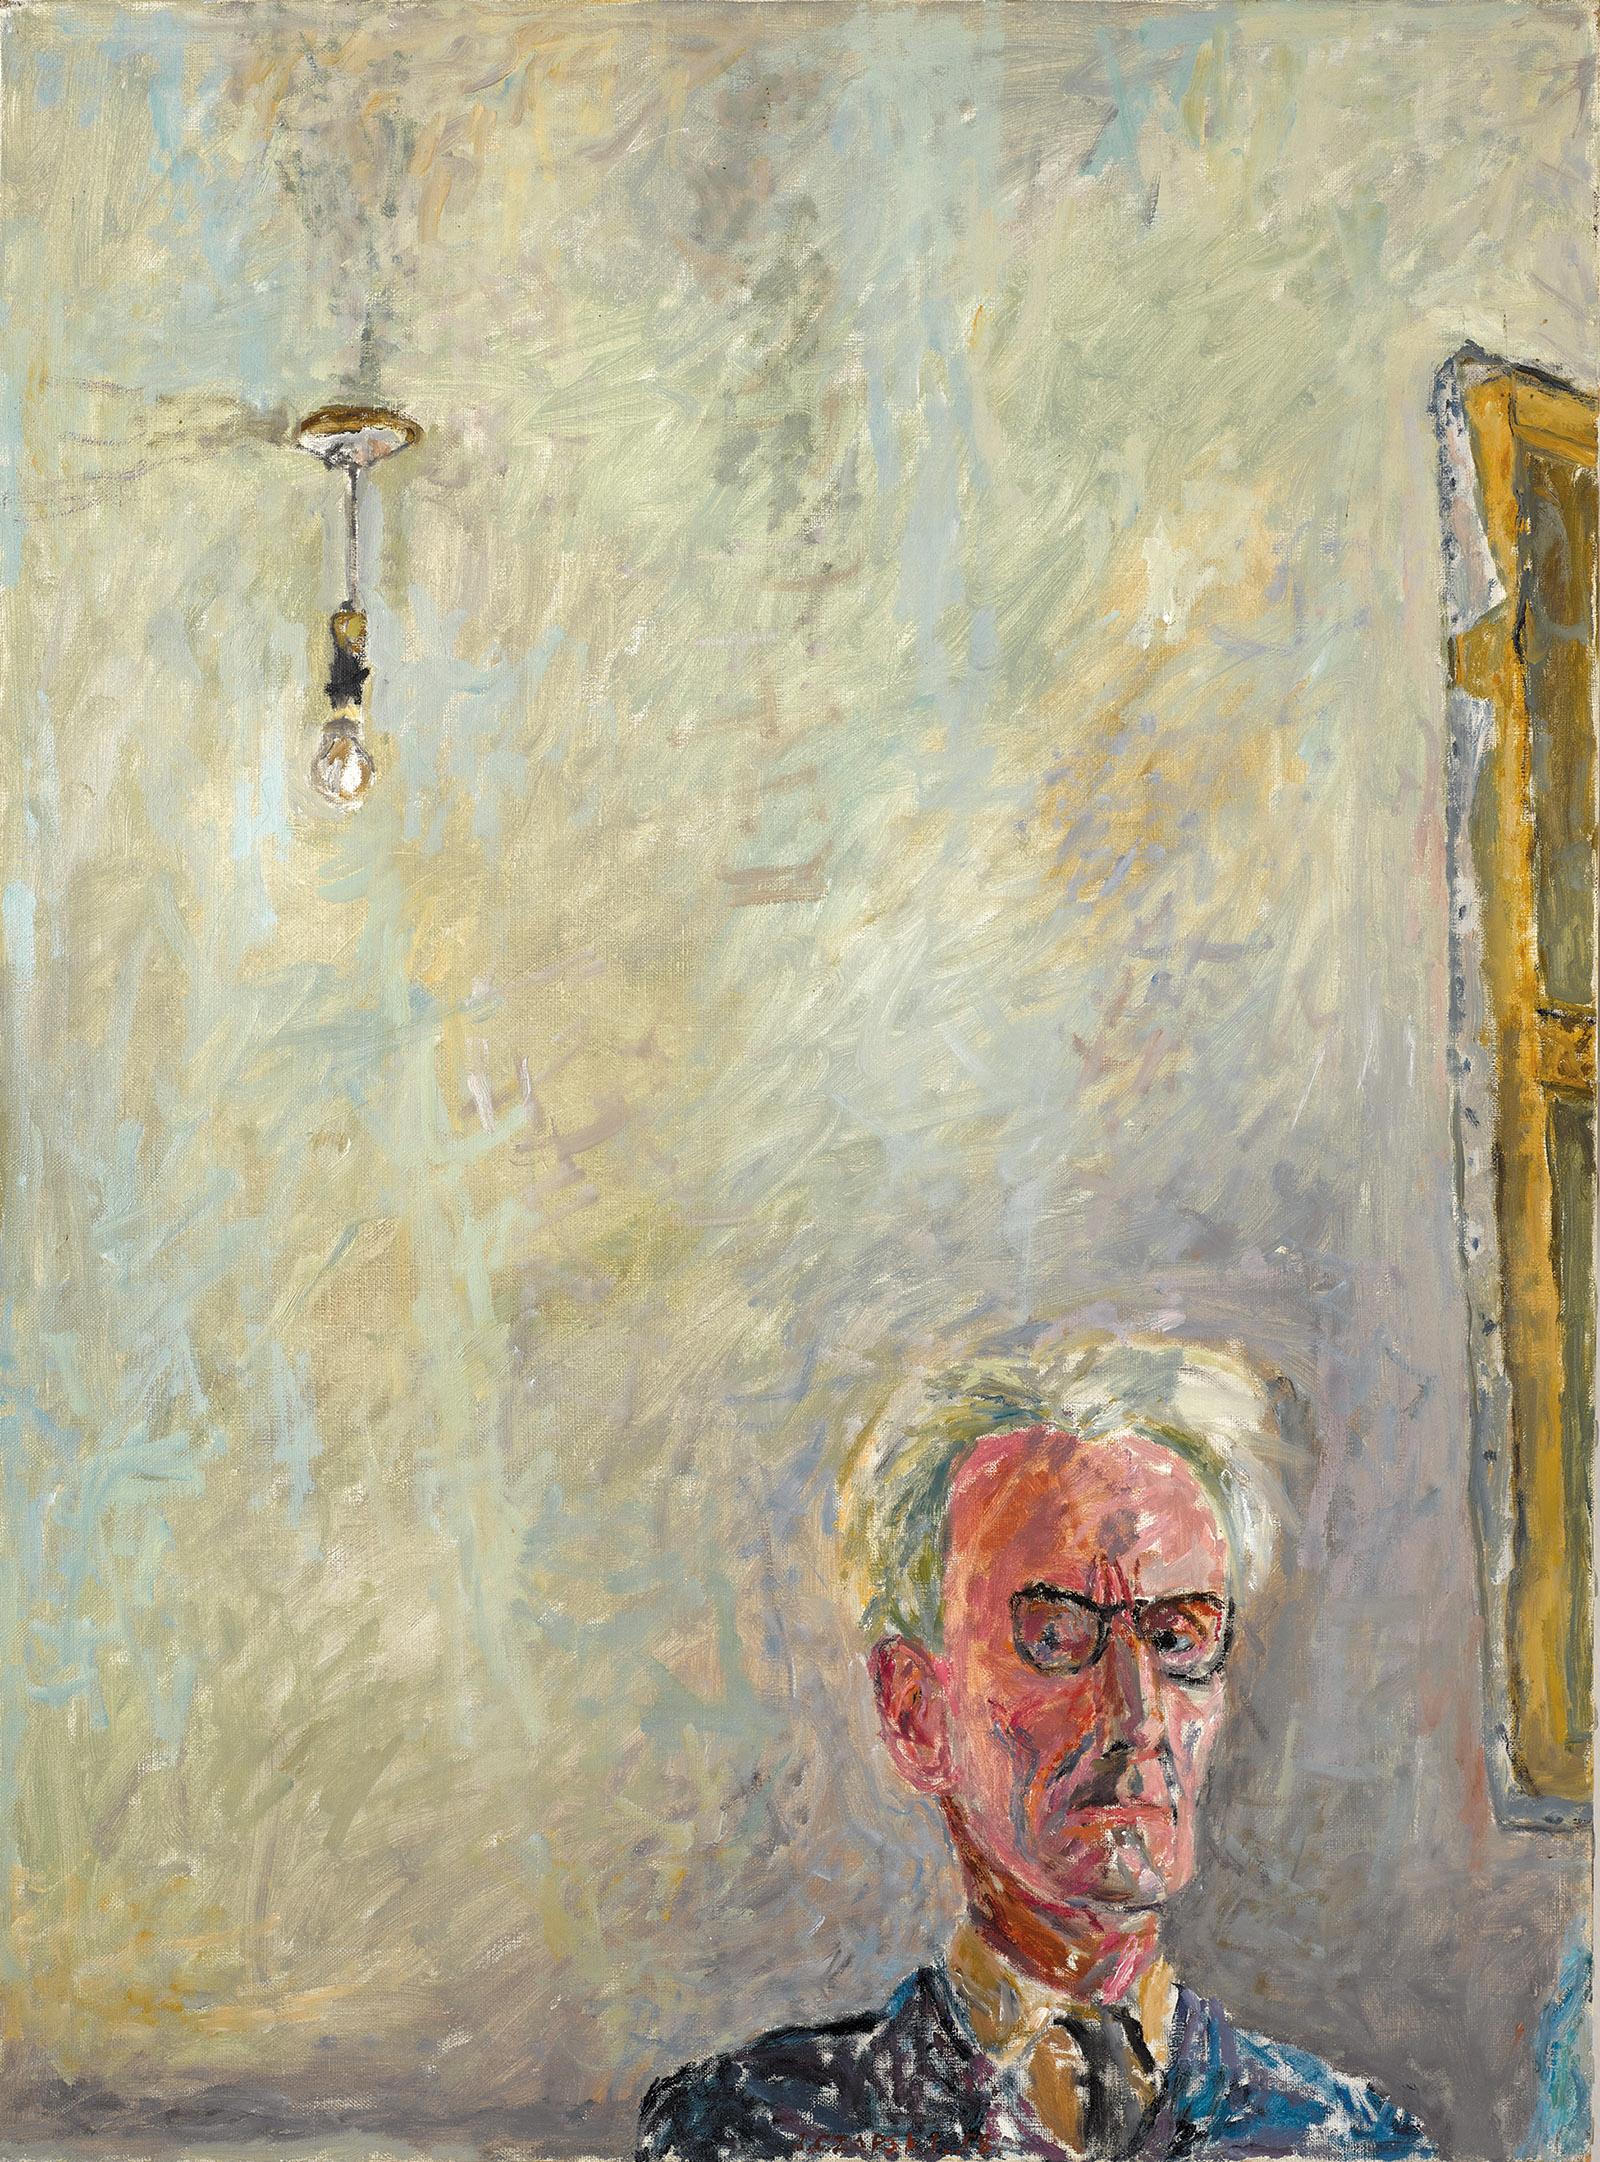 Józef Czapski: Self-Portrait with Lightbulb, 1958. An exhibition of his illustrated diaries is on view at the National Museum's Józef Czapski Pavilion, Kraków, until December 9, 2018.